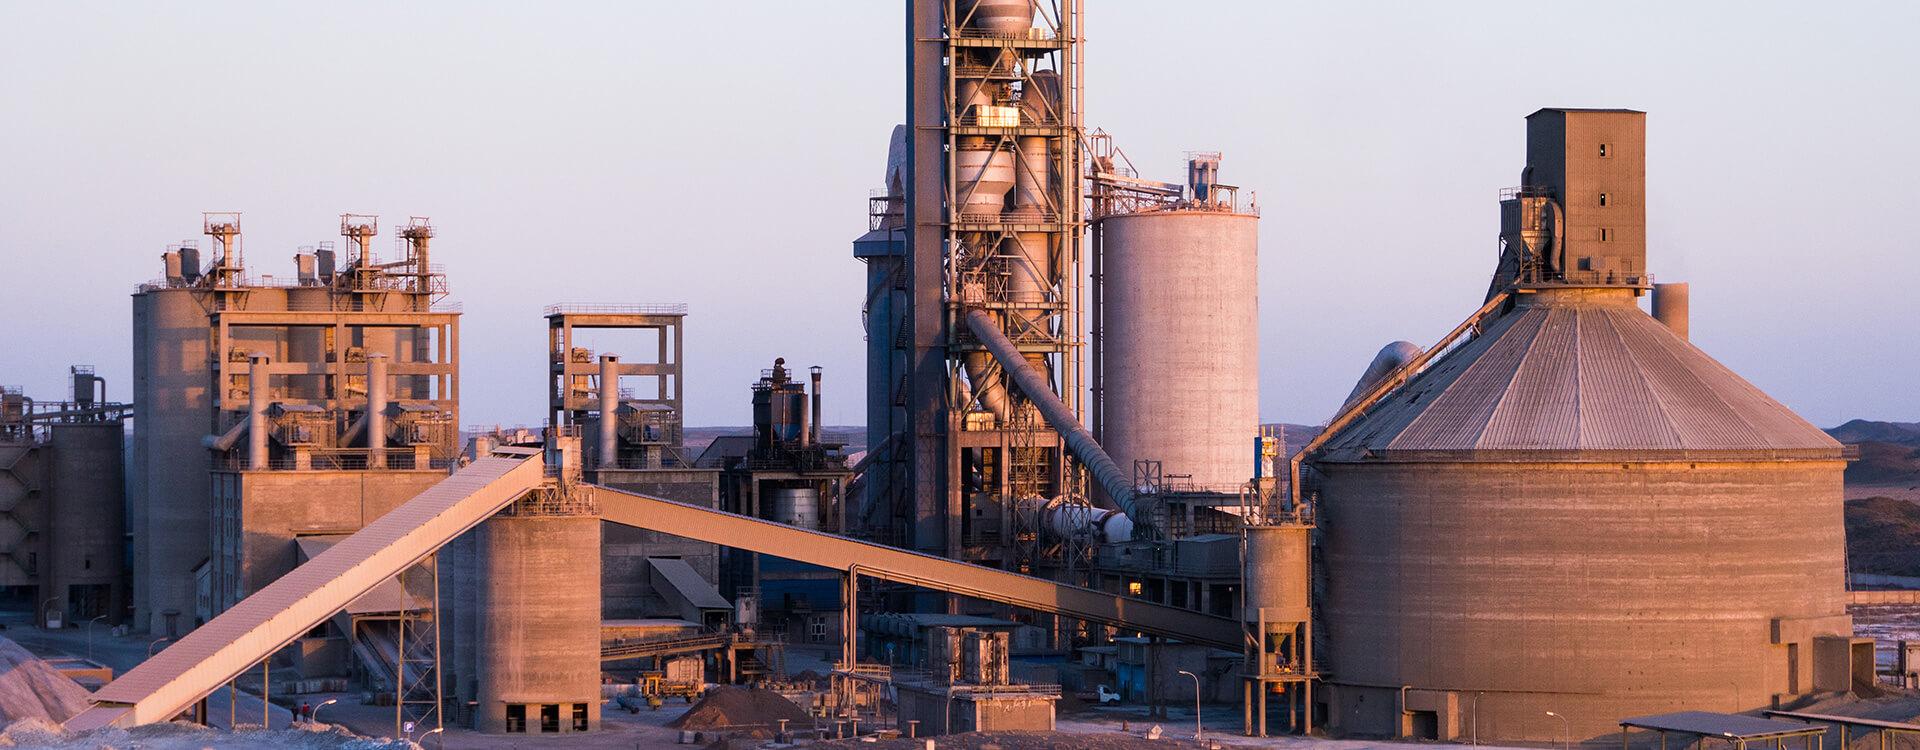 cimento fabrikasi urun satis mor endustri